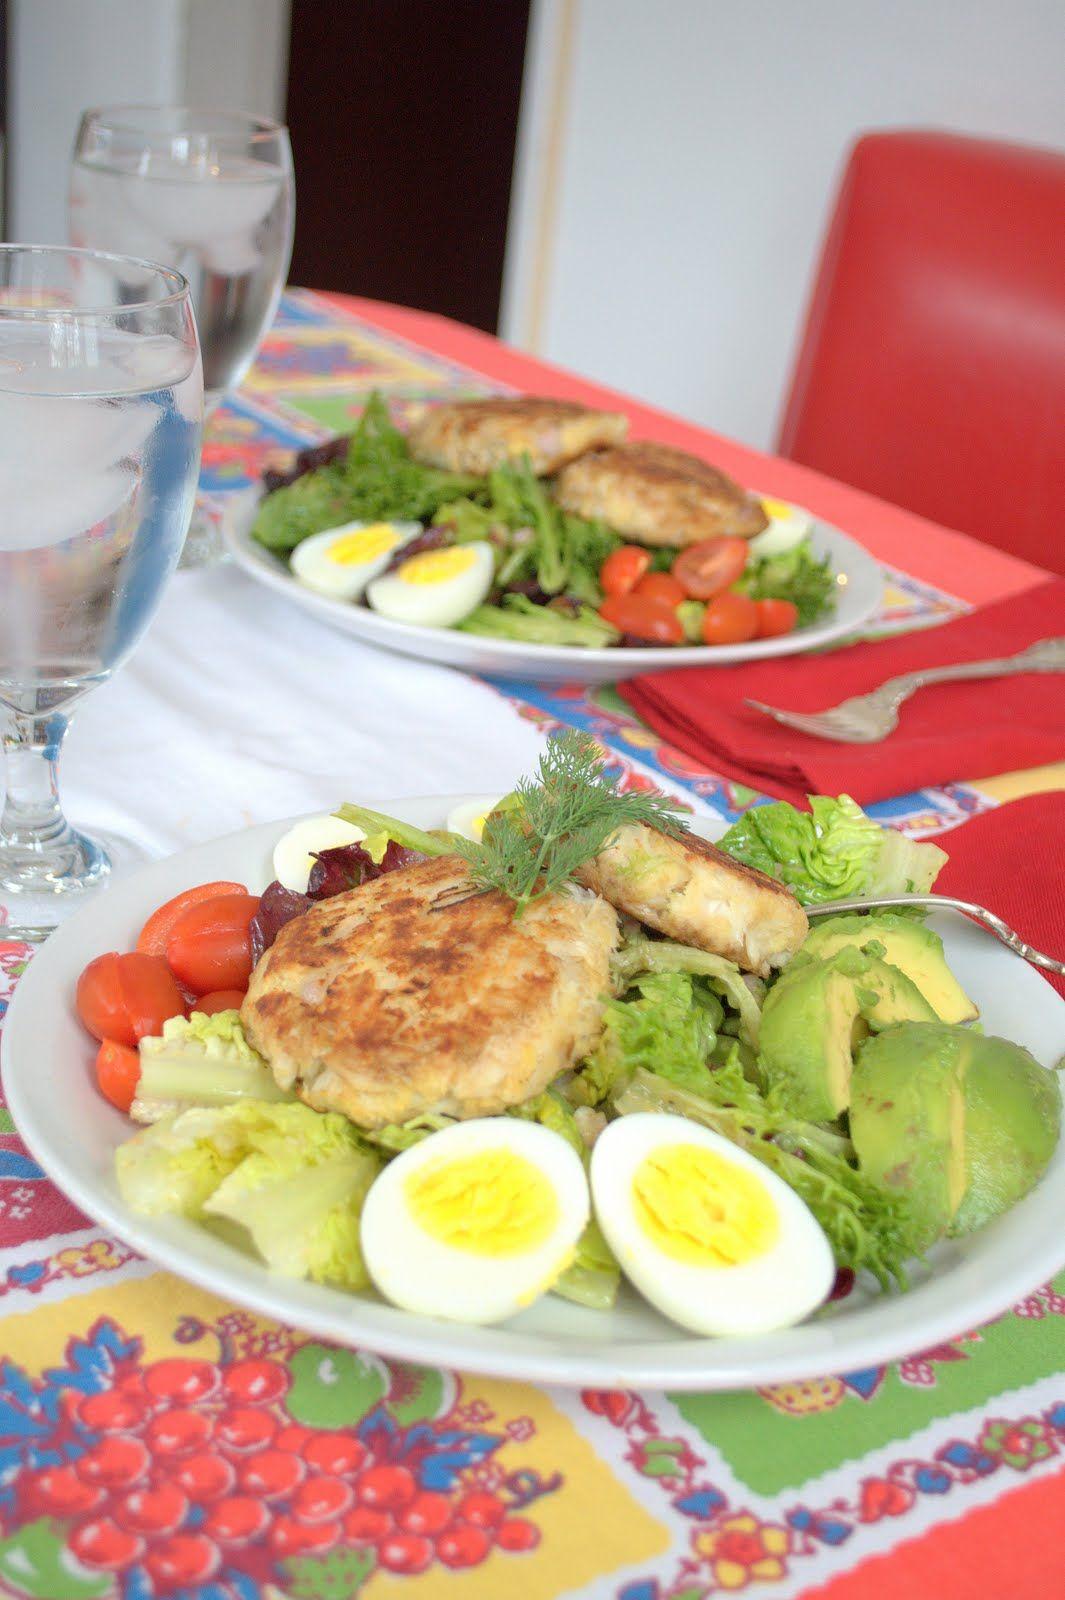 Hamburguesa vegetariana con ensalada y huevo duro